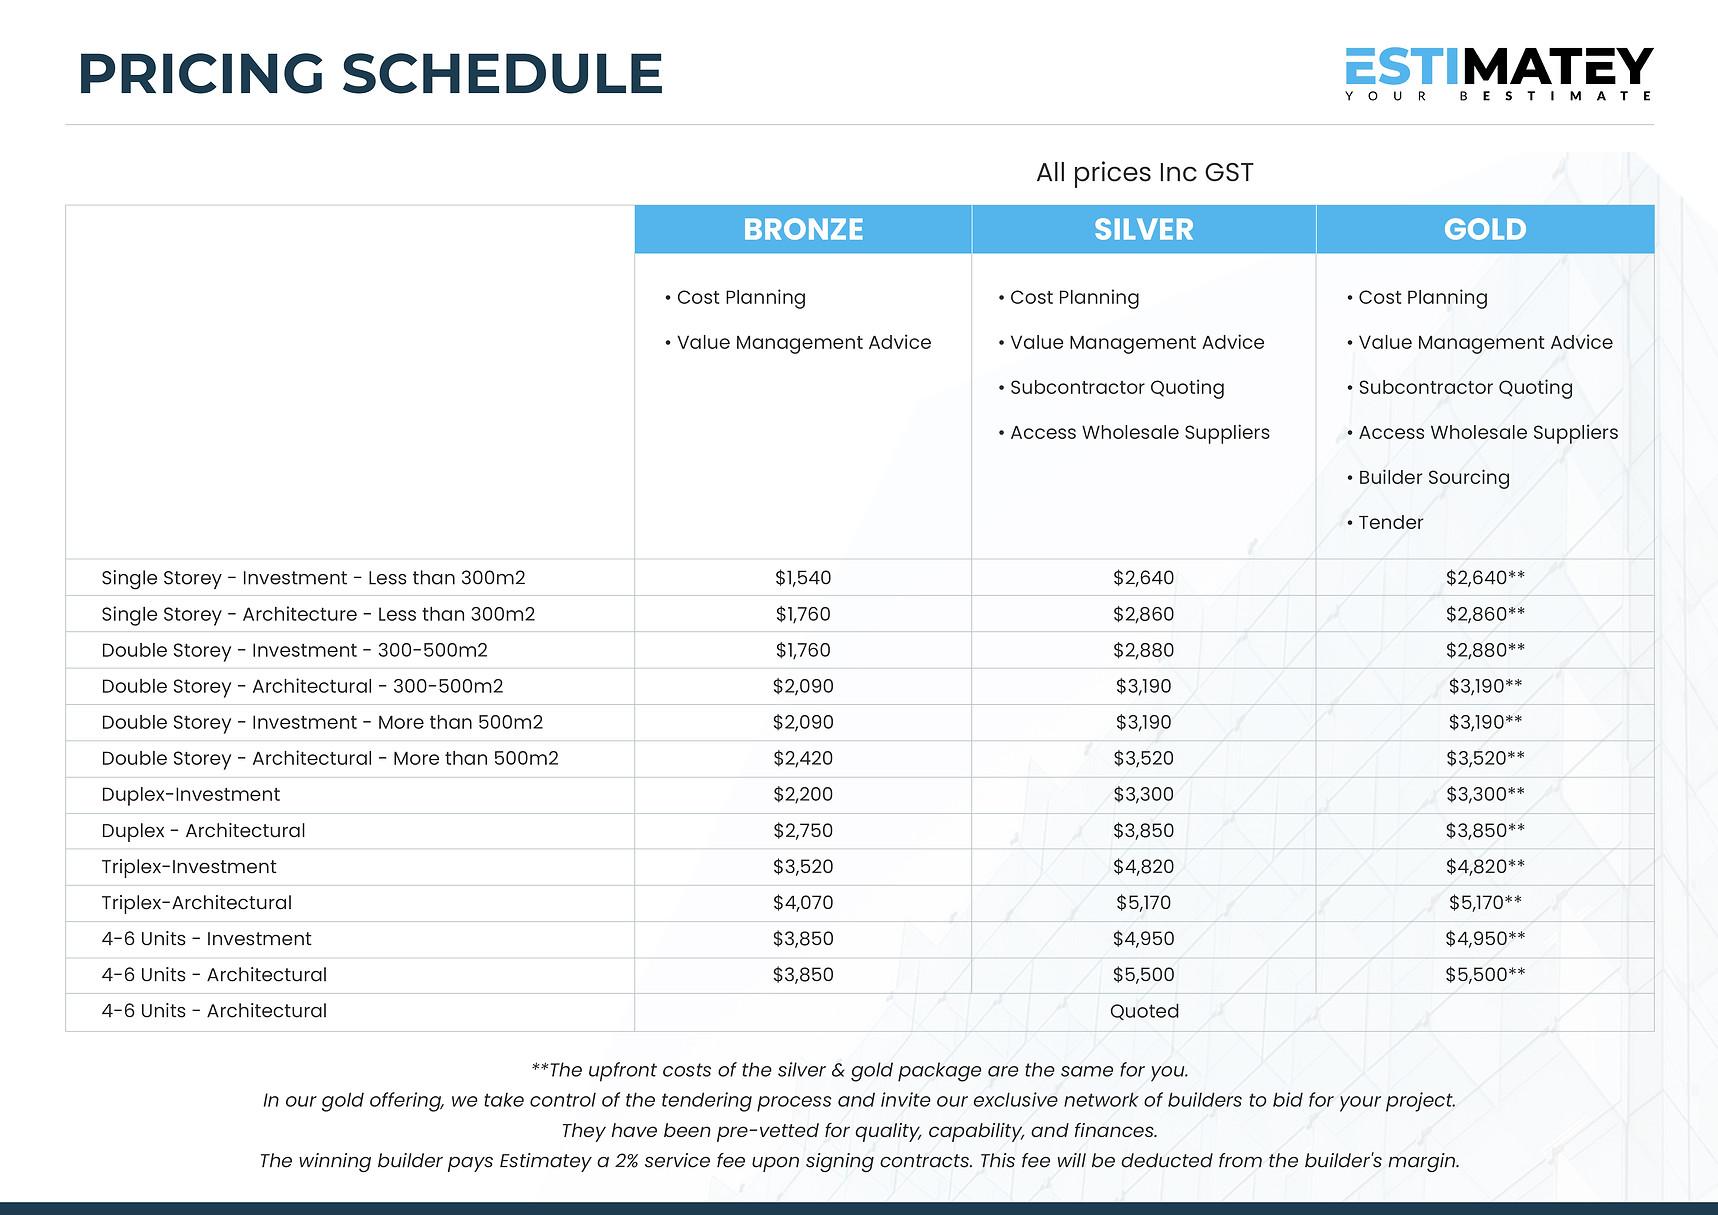 pricing estimatey.jpeg